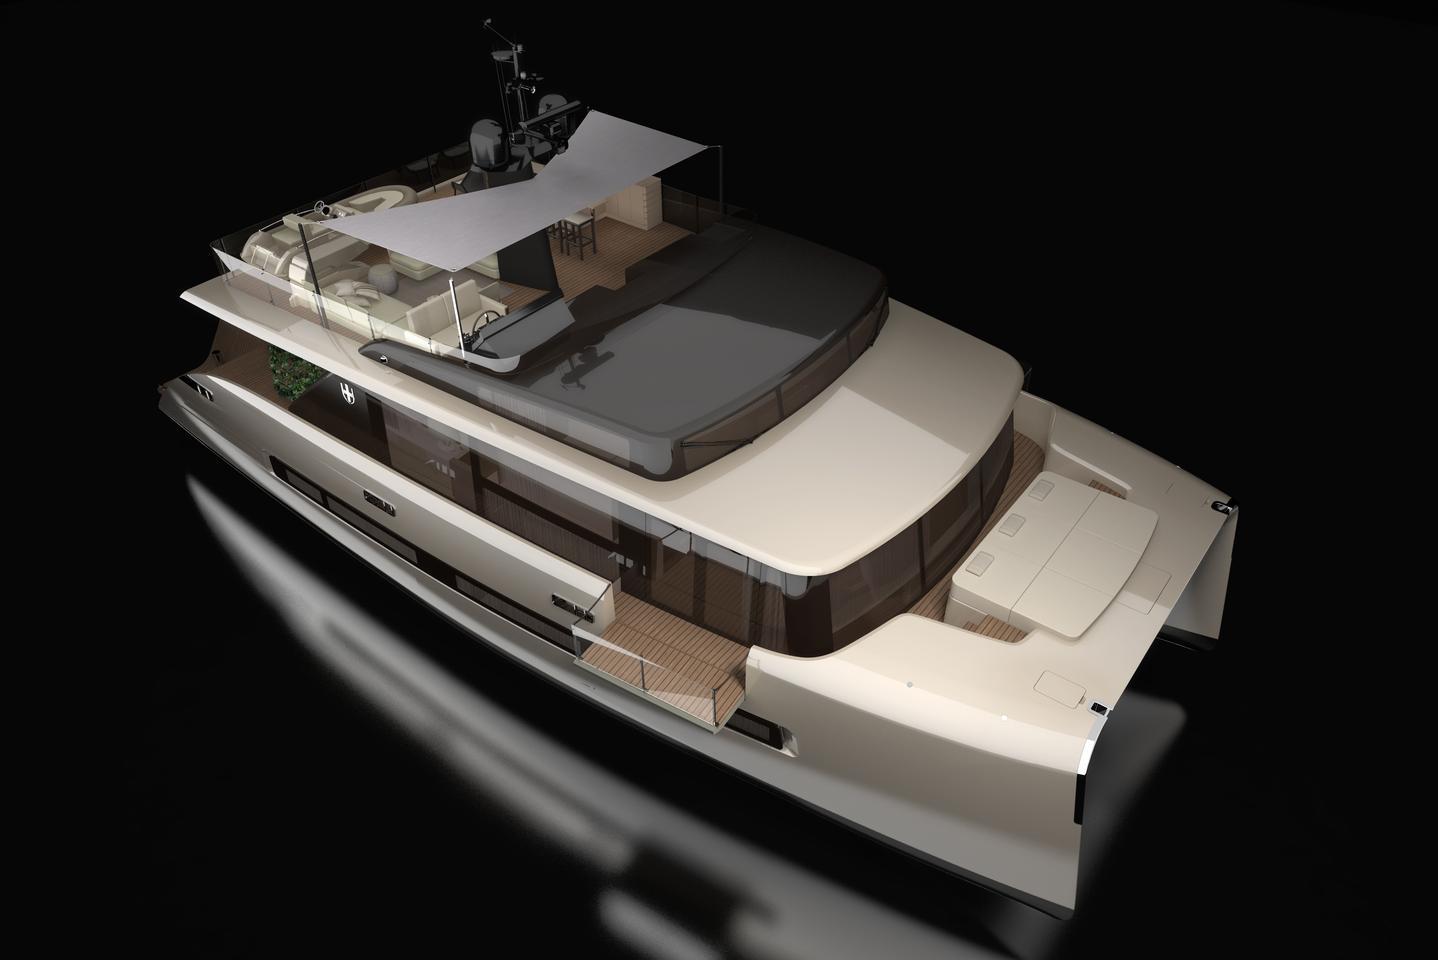 Picchio Boat by yacht designer Christian Grande